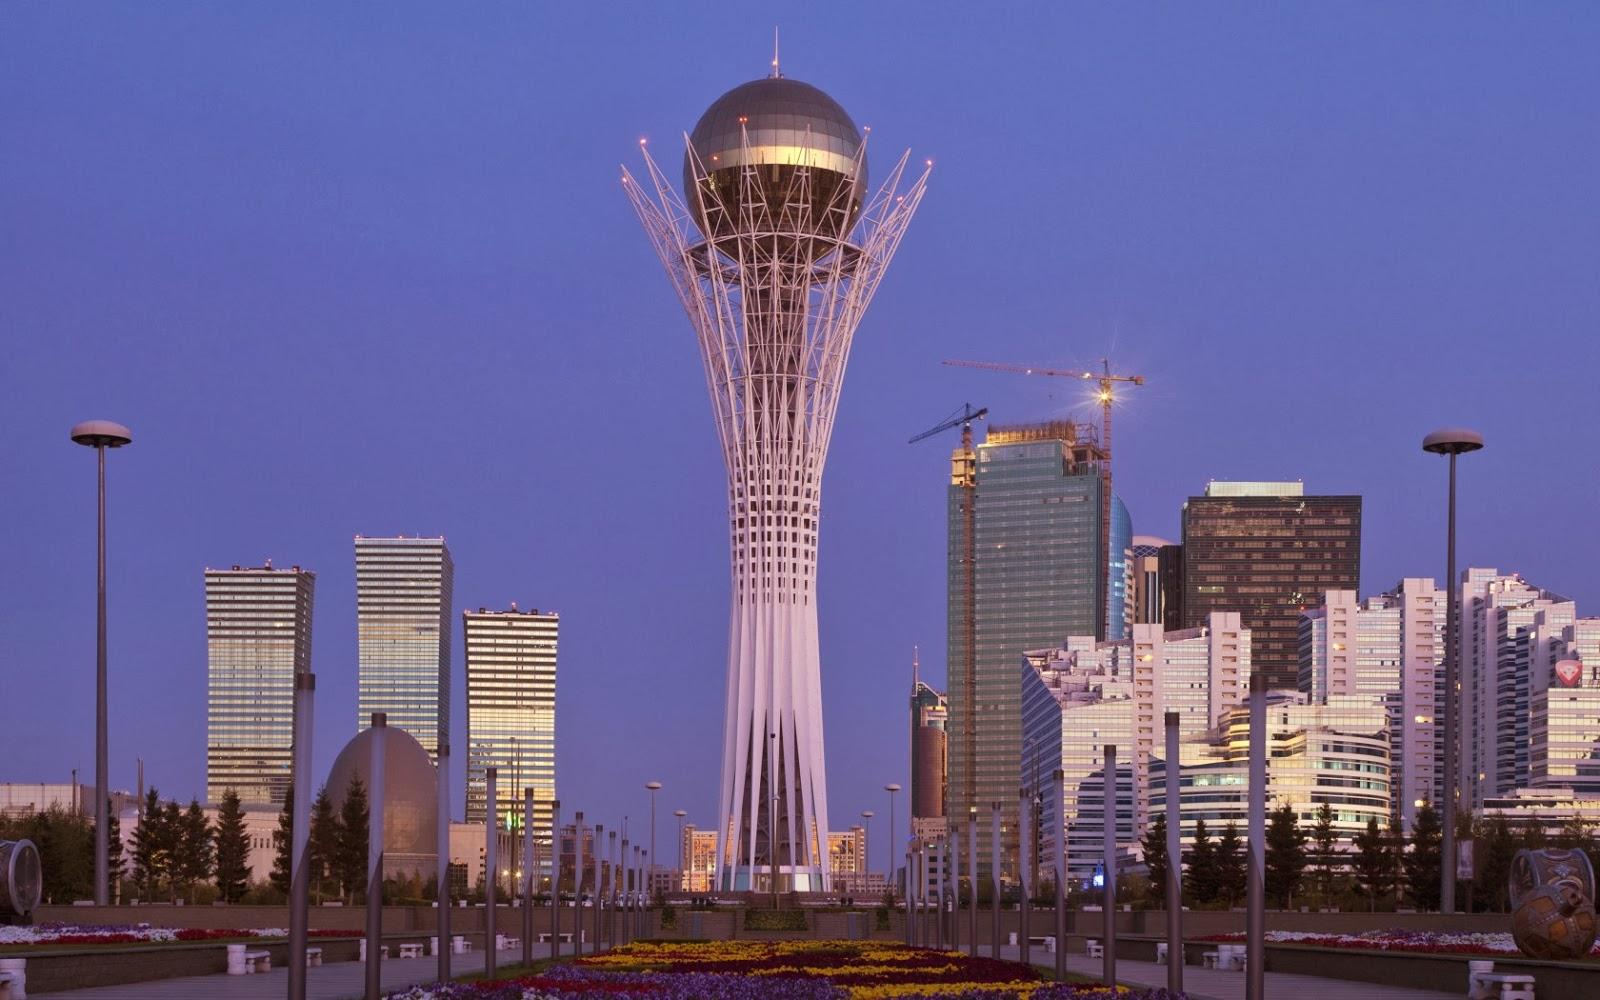 Bayterek Tower,Astana, Kazakhstan: